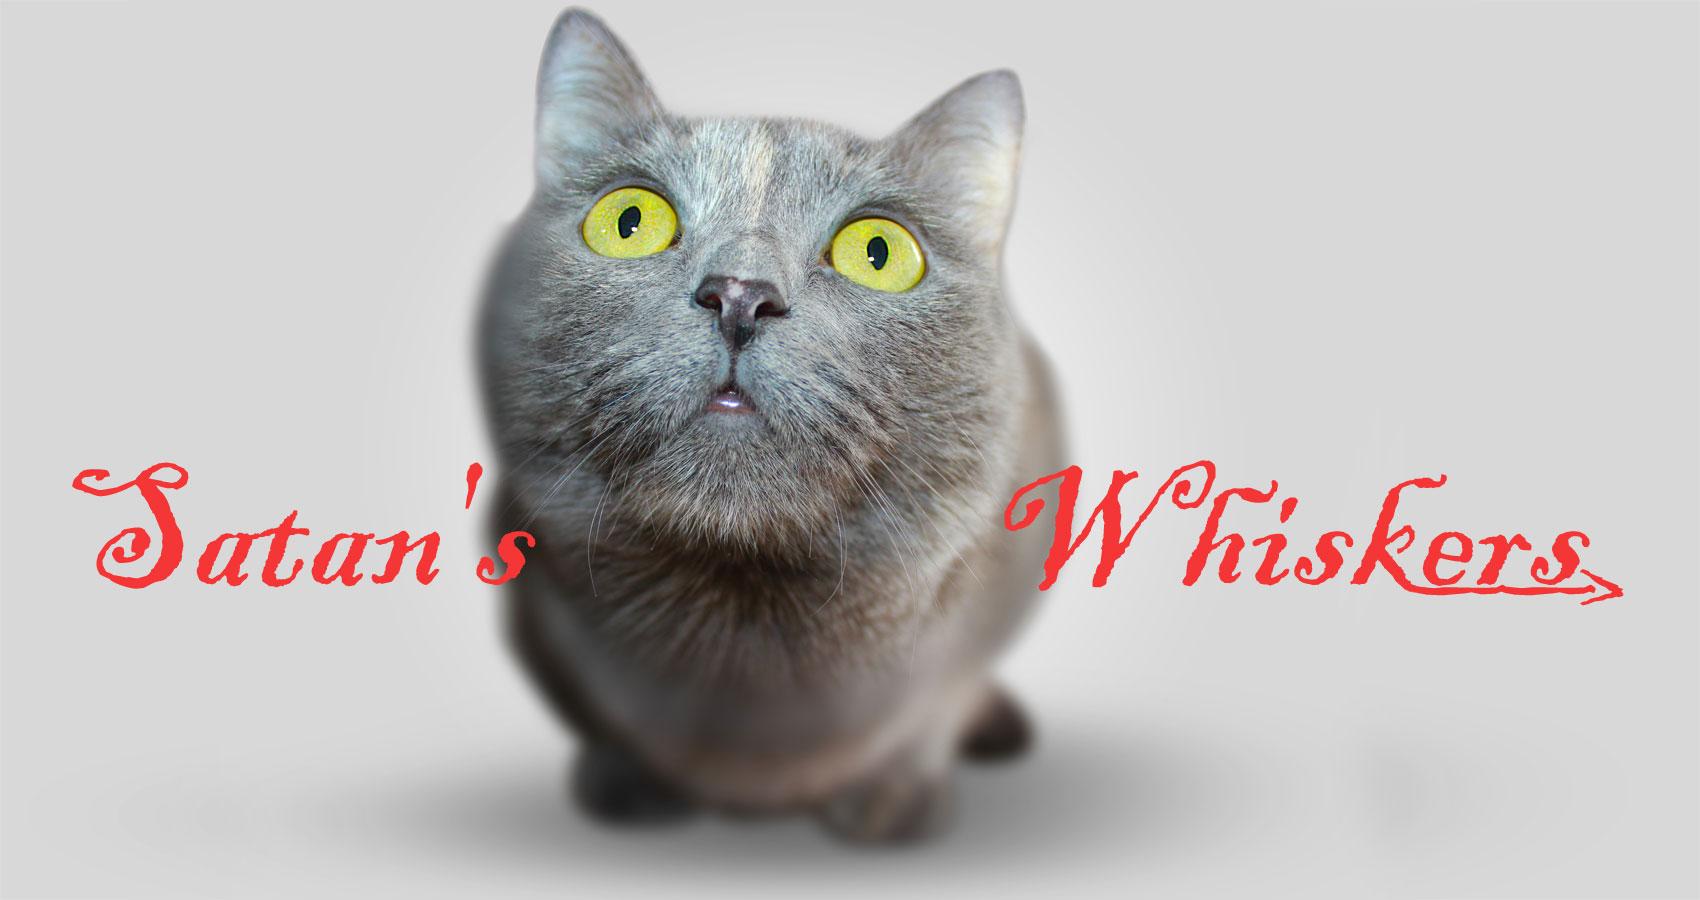 Satan's Whiskers written by Lorenzo Berardiat Spillwords.com